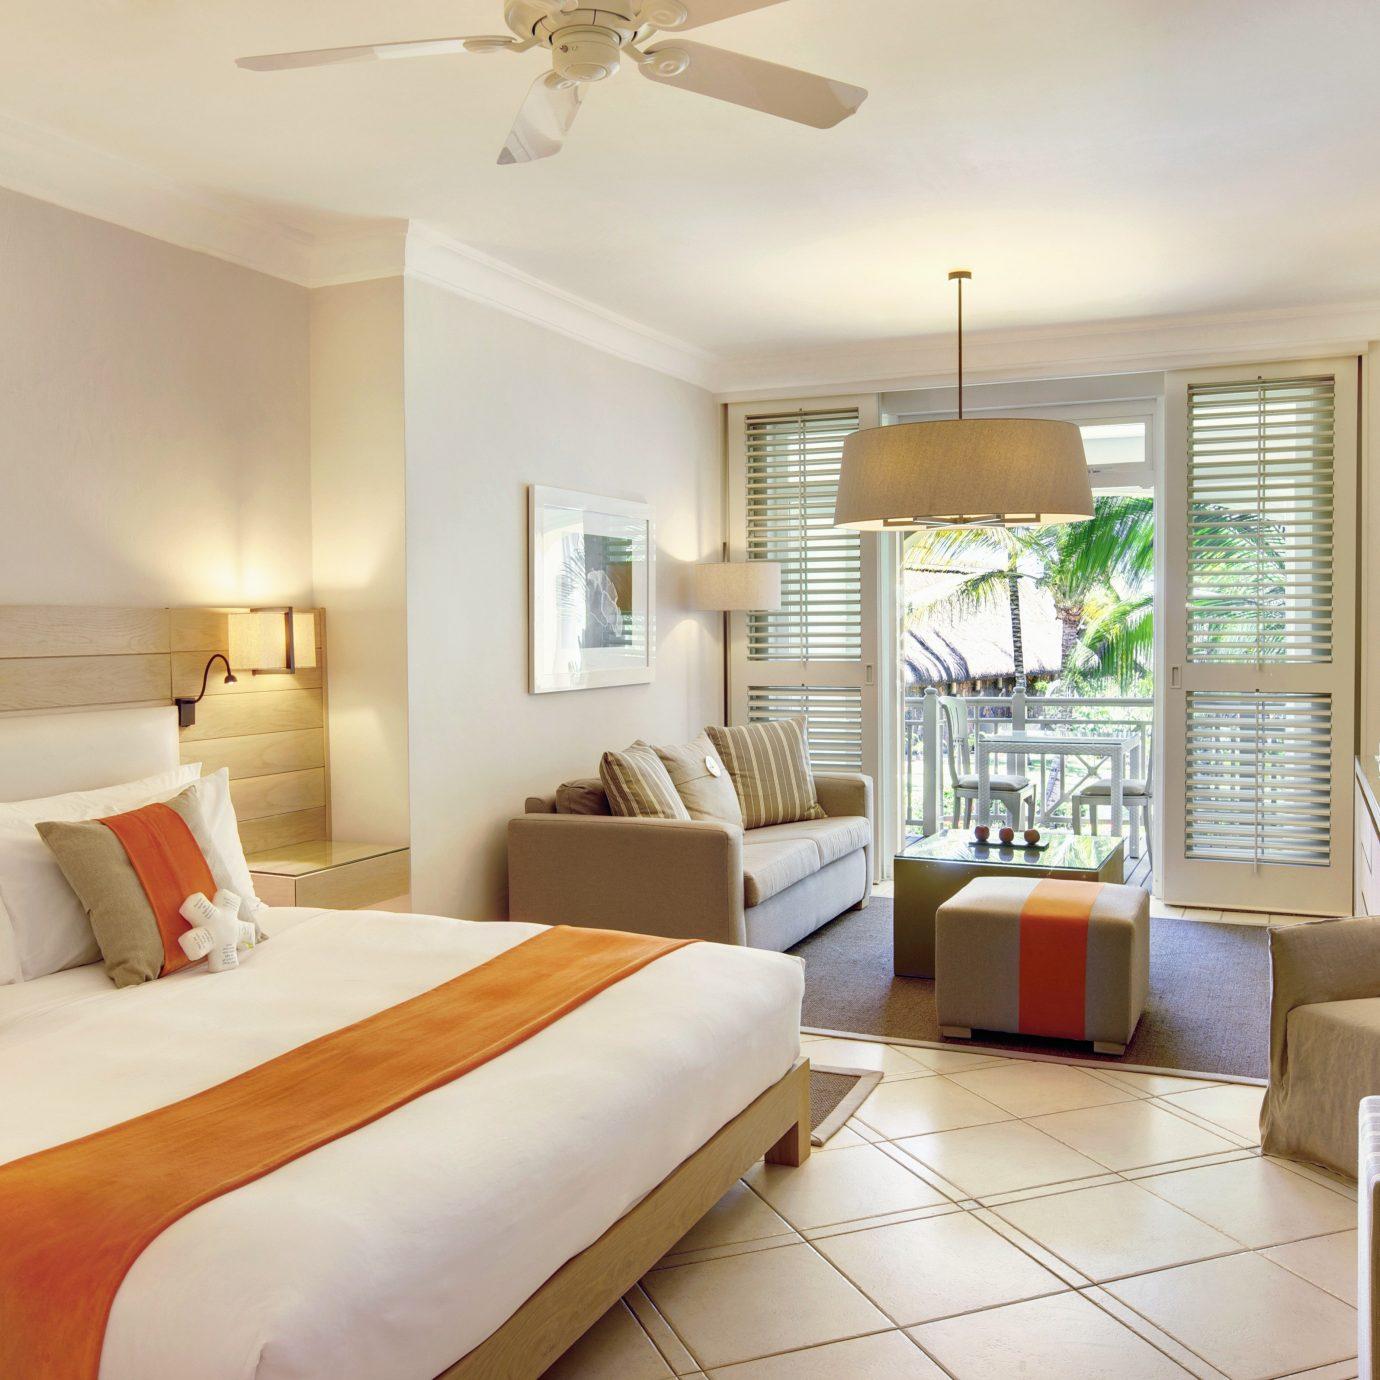 Bedroom Luxury Modern Scenic views Suite sofa property condominium living room cottage